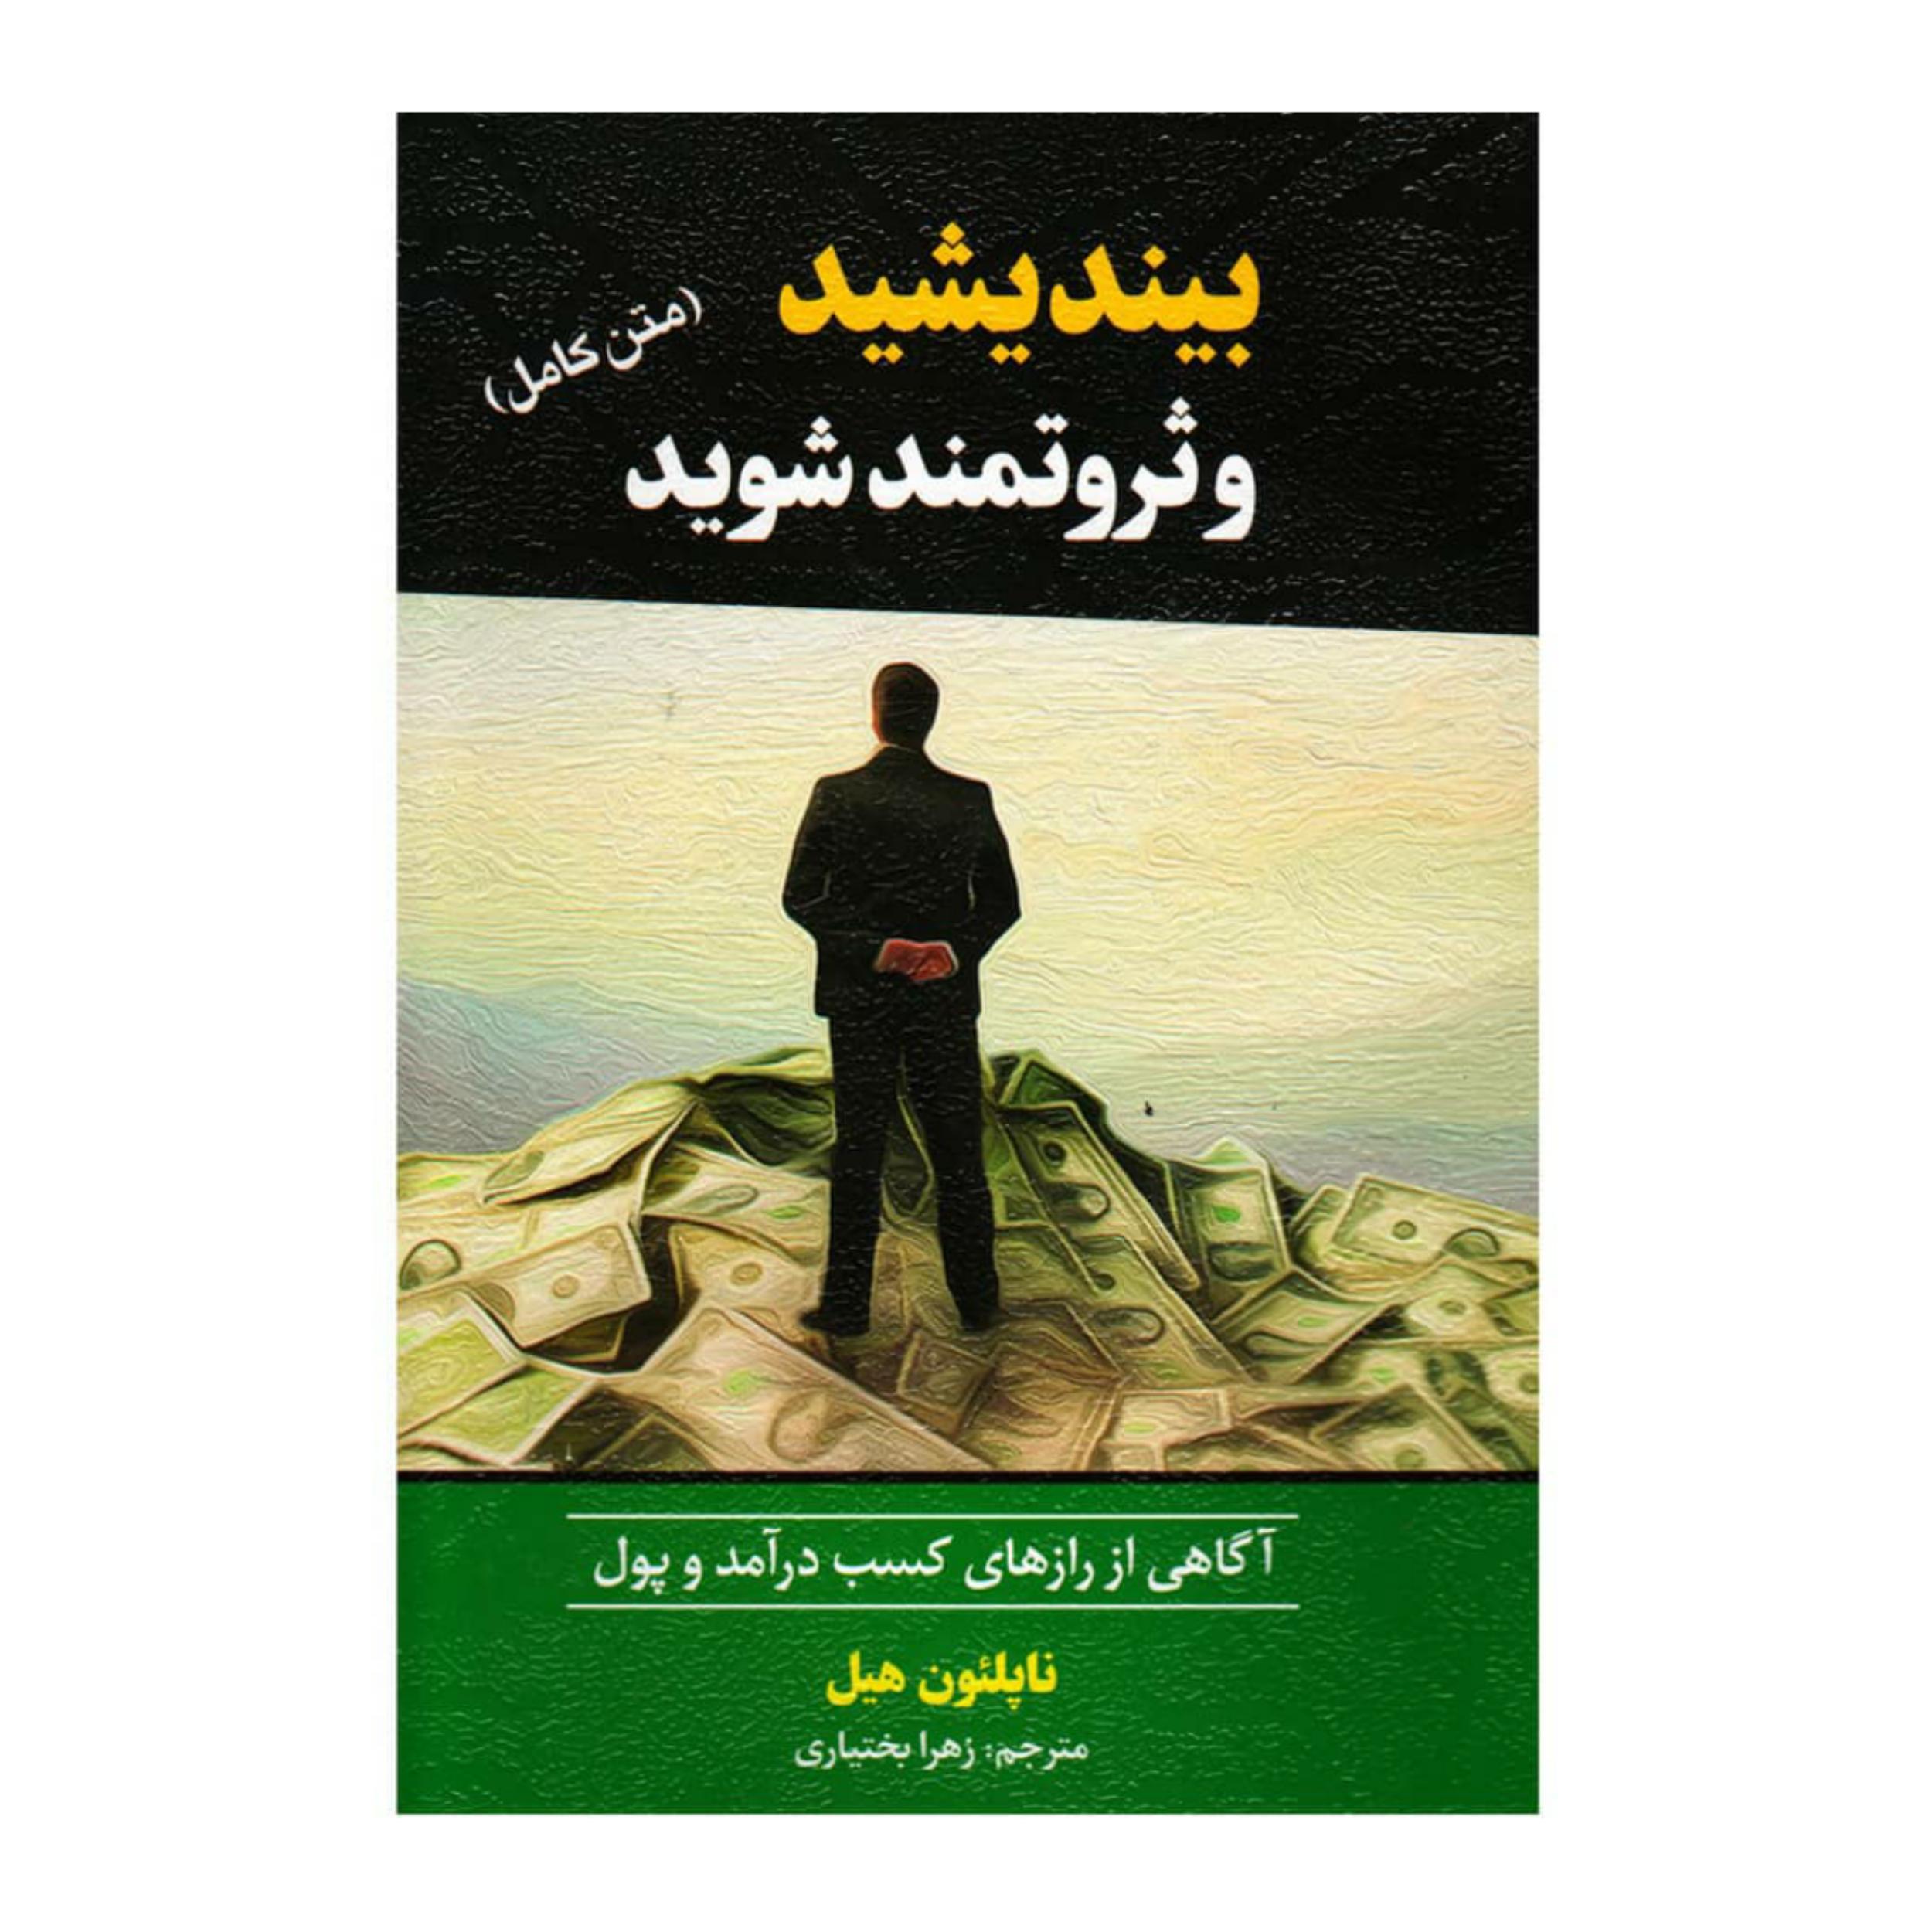 خرید                      کتاب بیندیشید و ثروتمند شوید اثر ناپلئون هیل انتشارات آستان مهر